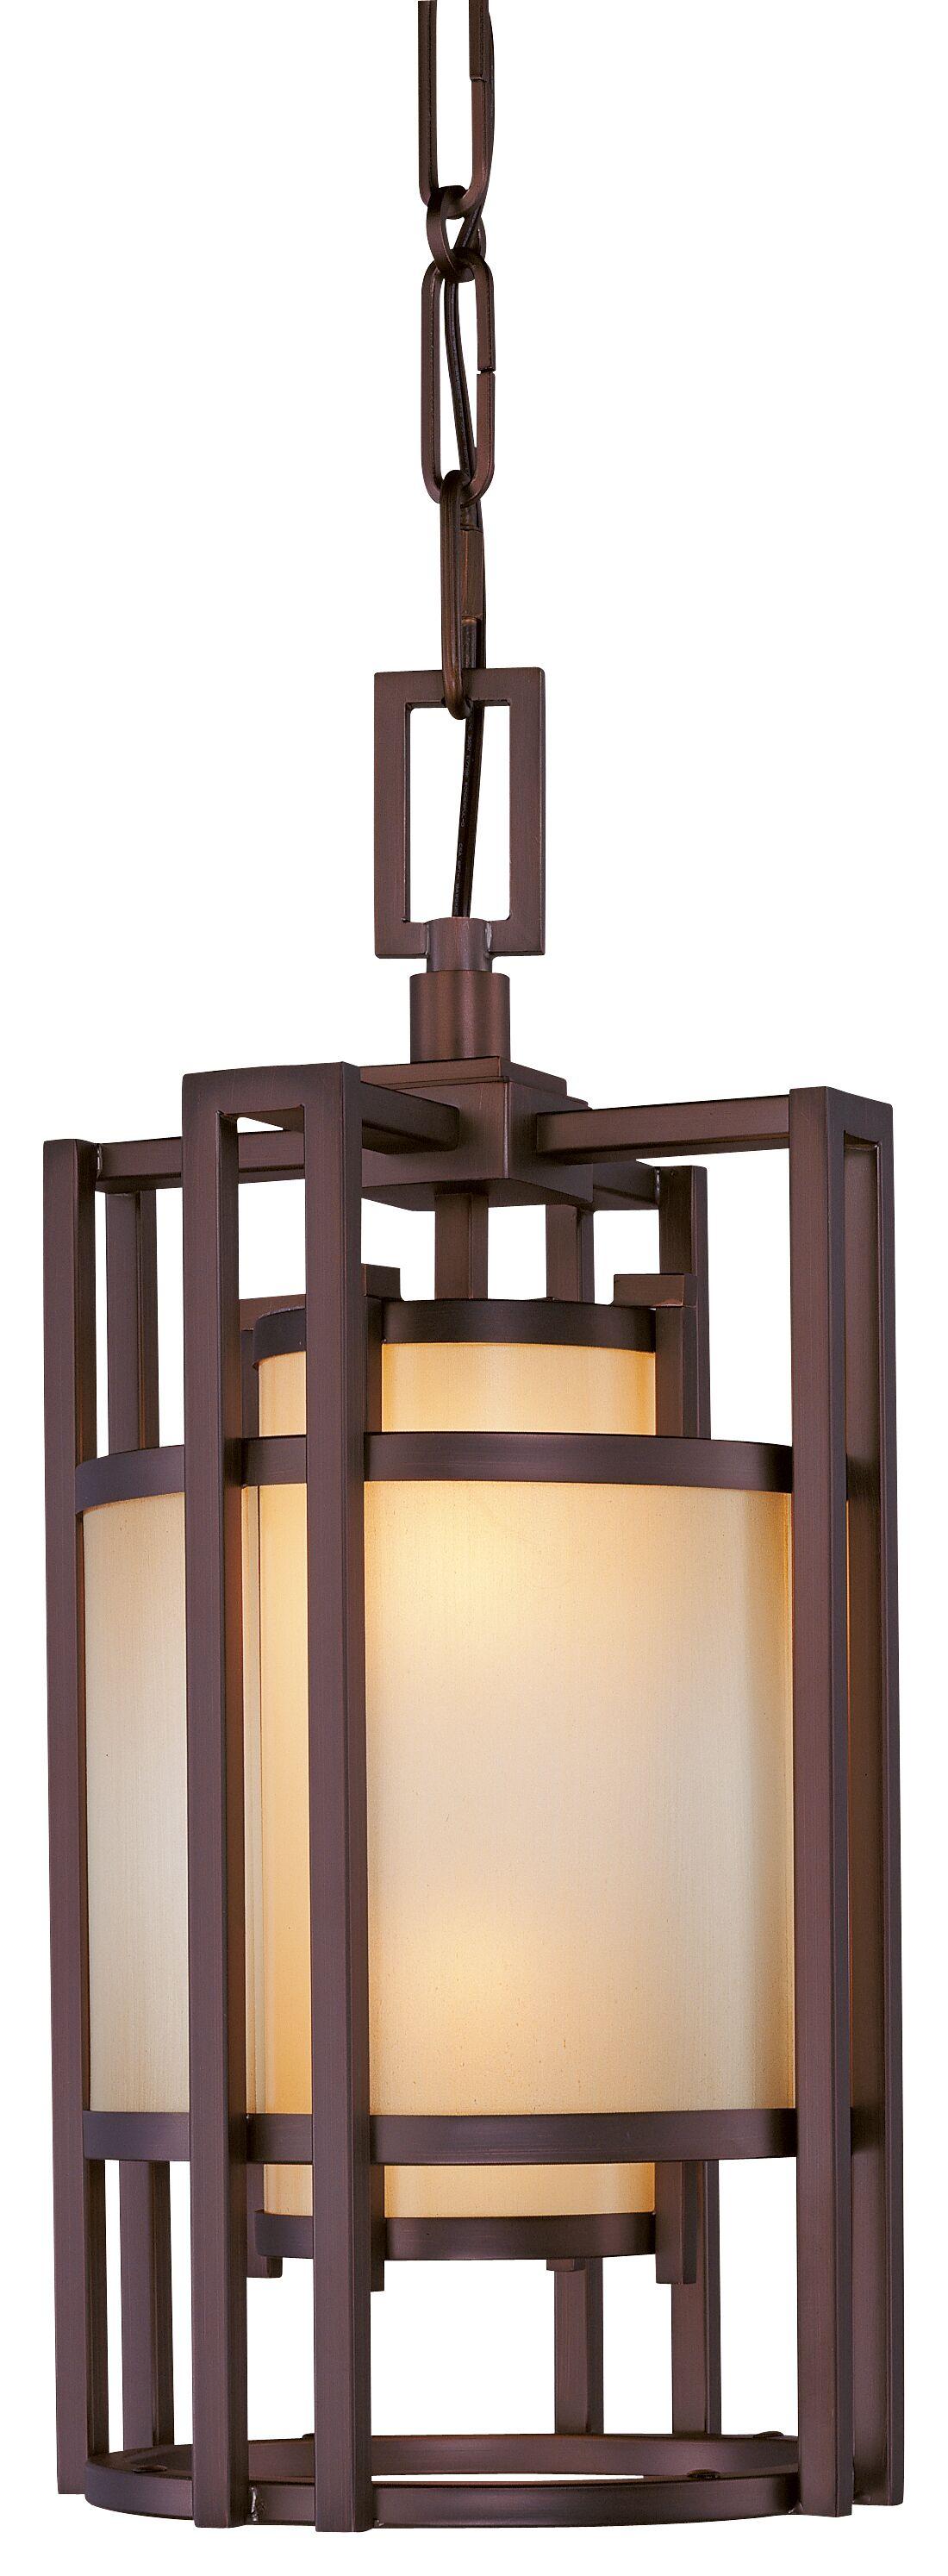 Underscore 2-Light Square/Rectangle Pendant